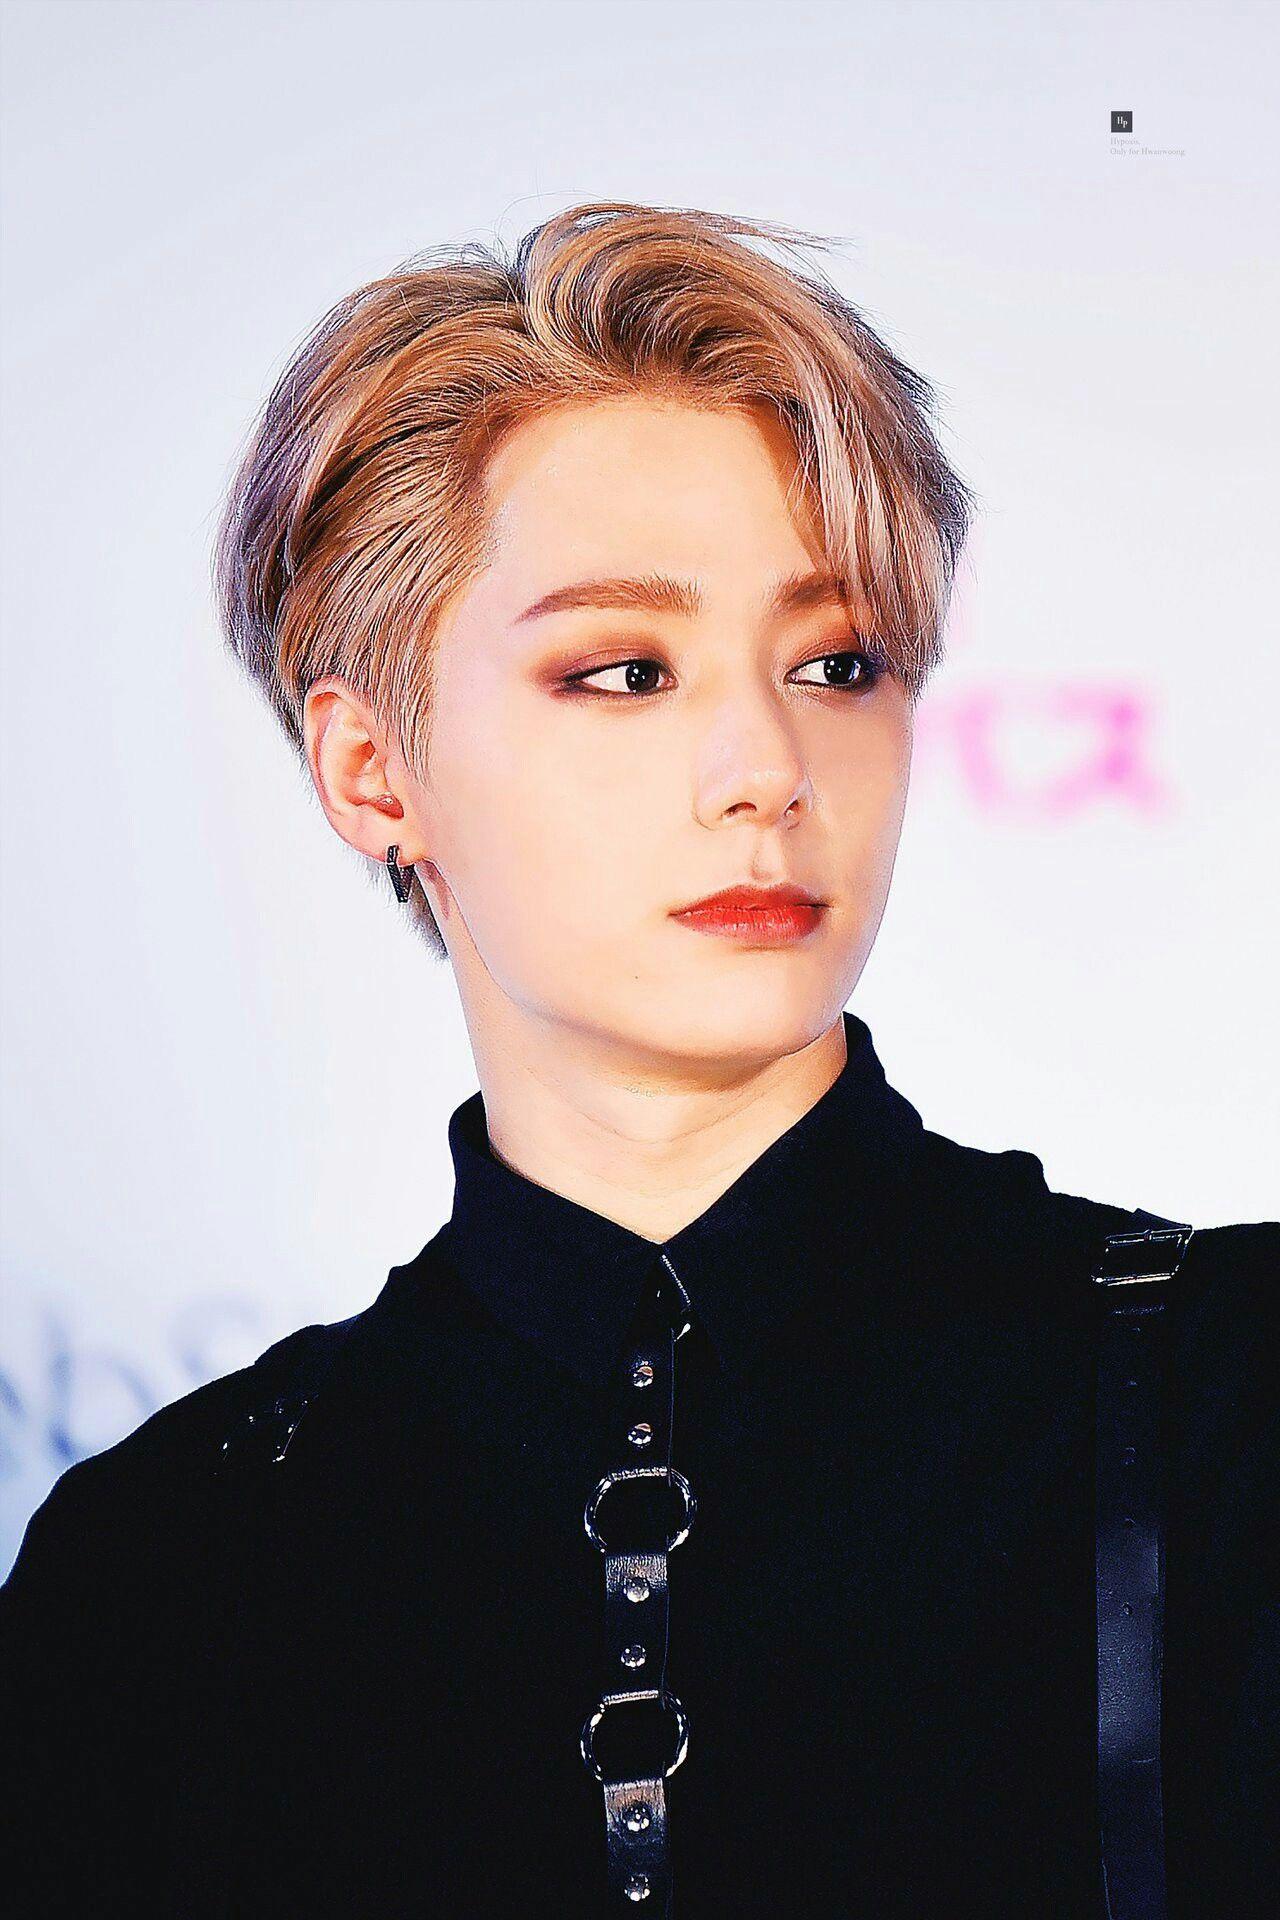 Pin By Bbhsun On Kpop Korean Men Hairstyle Boy Bands Kpop Idol